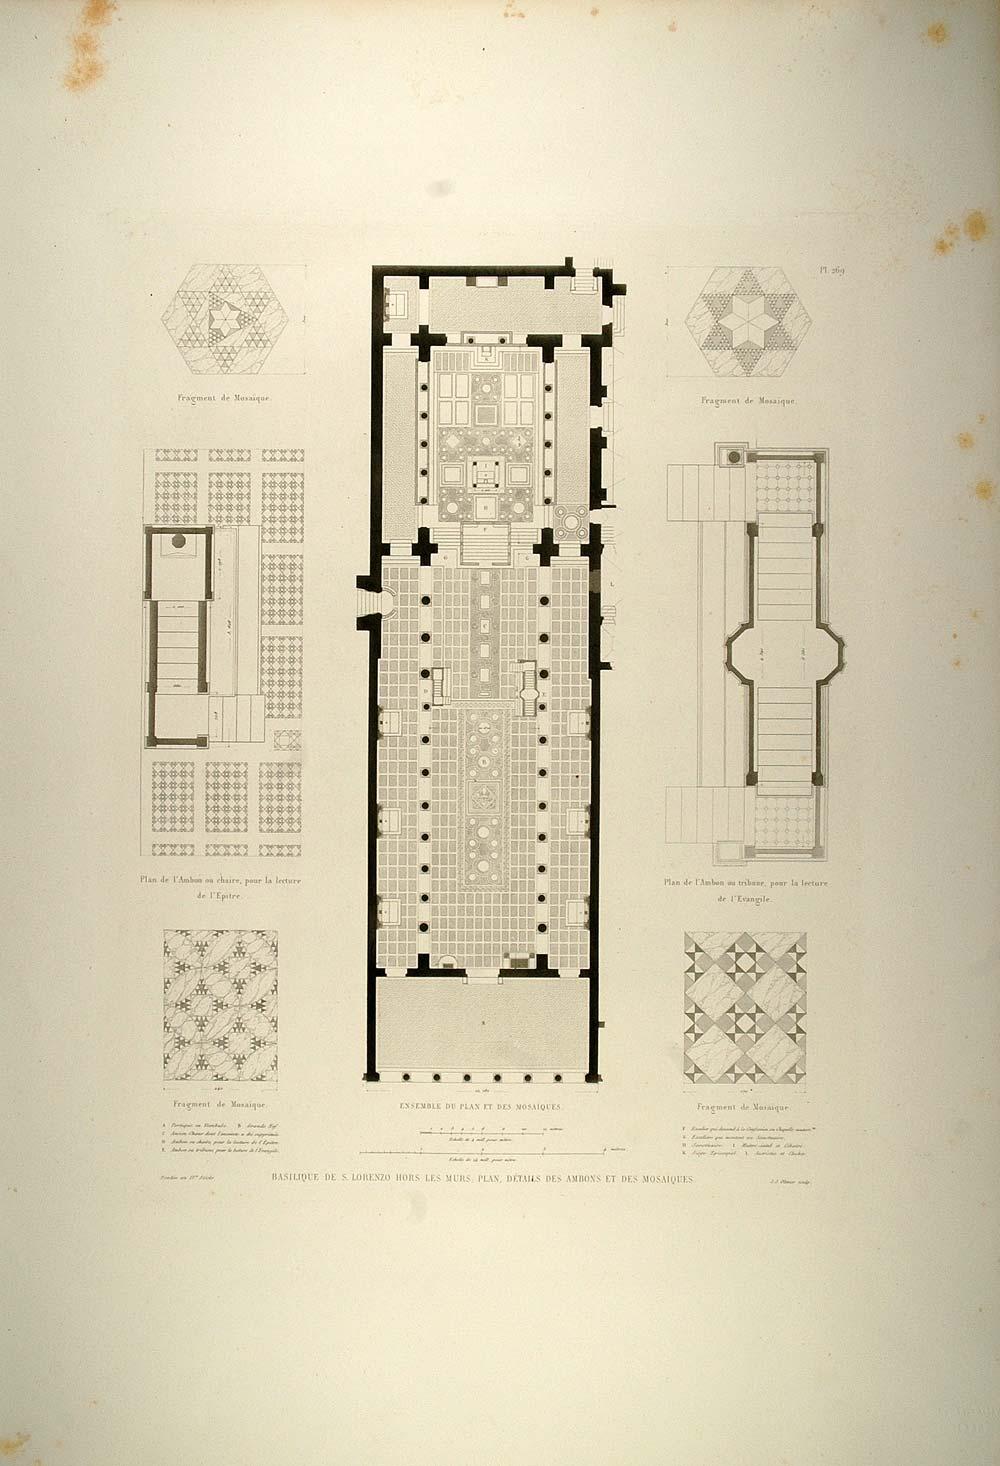 1860 engraving basilica san lorenzo fuori le mura plan original rm1 period paper [ 1000 x 1466 Pixel ]